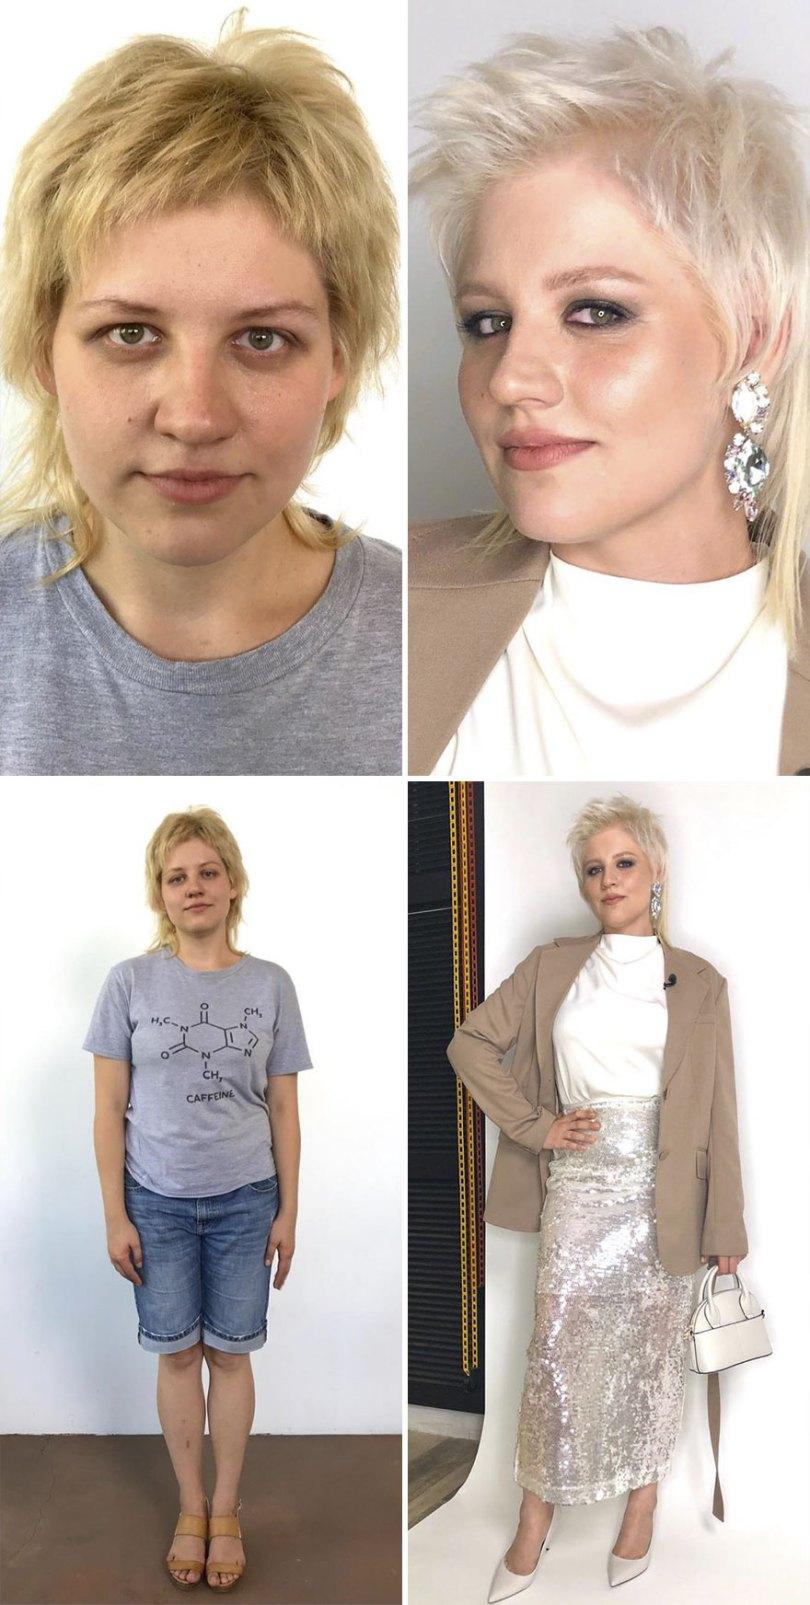 "5dc52269c17d1 before after transformations stylist alexander rogov 133 5dc427982801b  880 - Resultado impressionante de pessoas ""repaginadas"" por estilista russo"